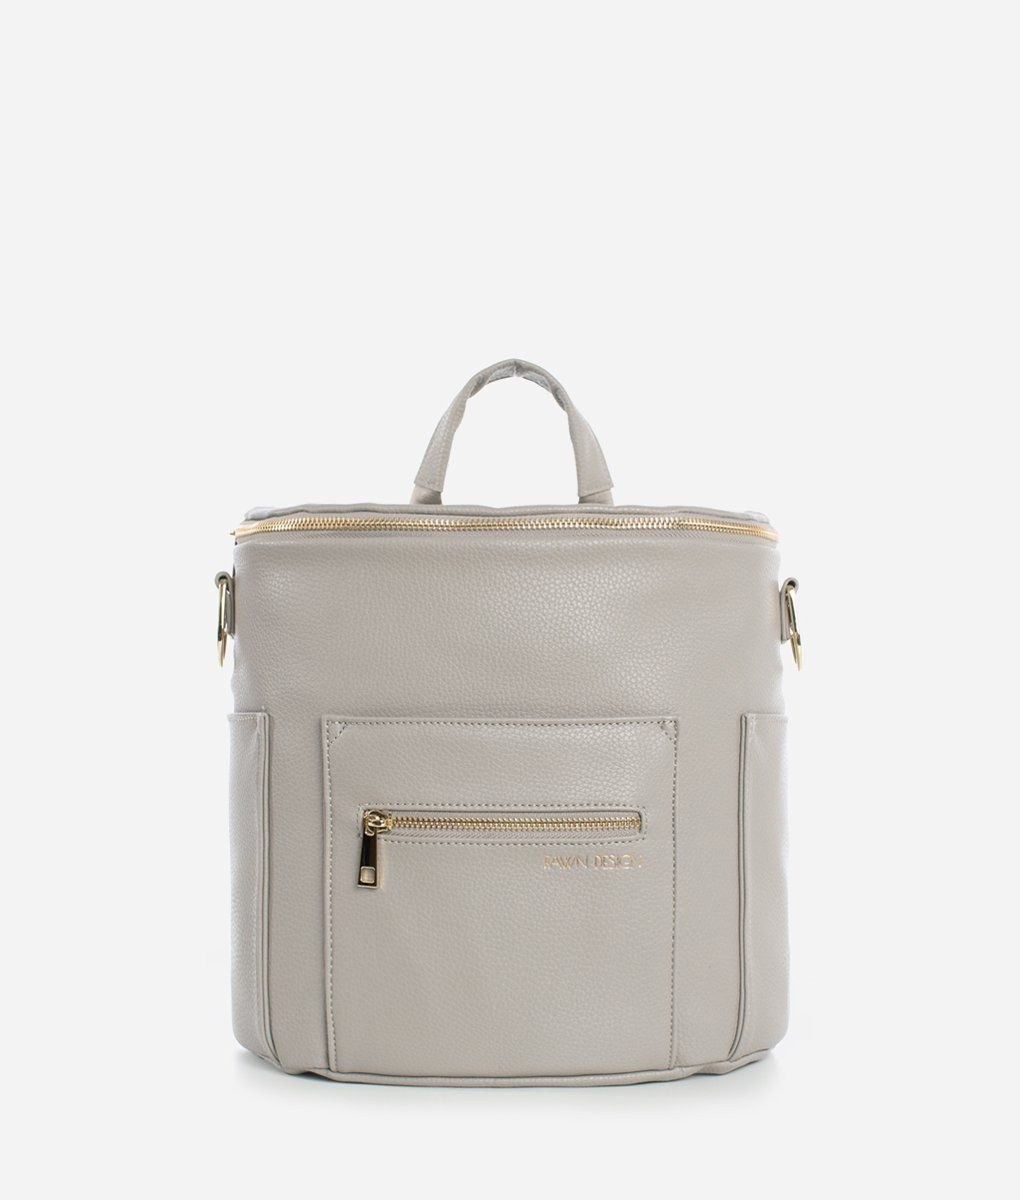 Fawn Design Mini Diaper Bag